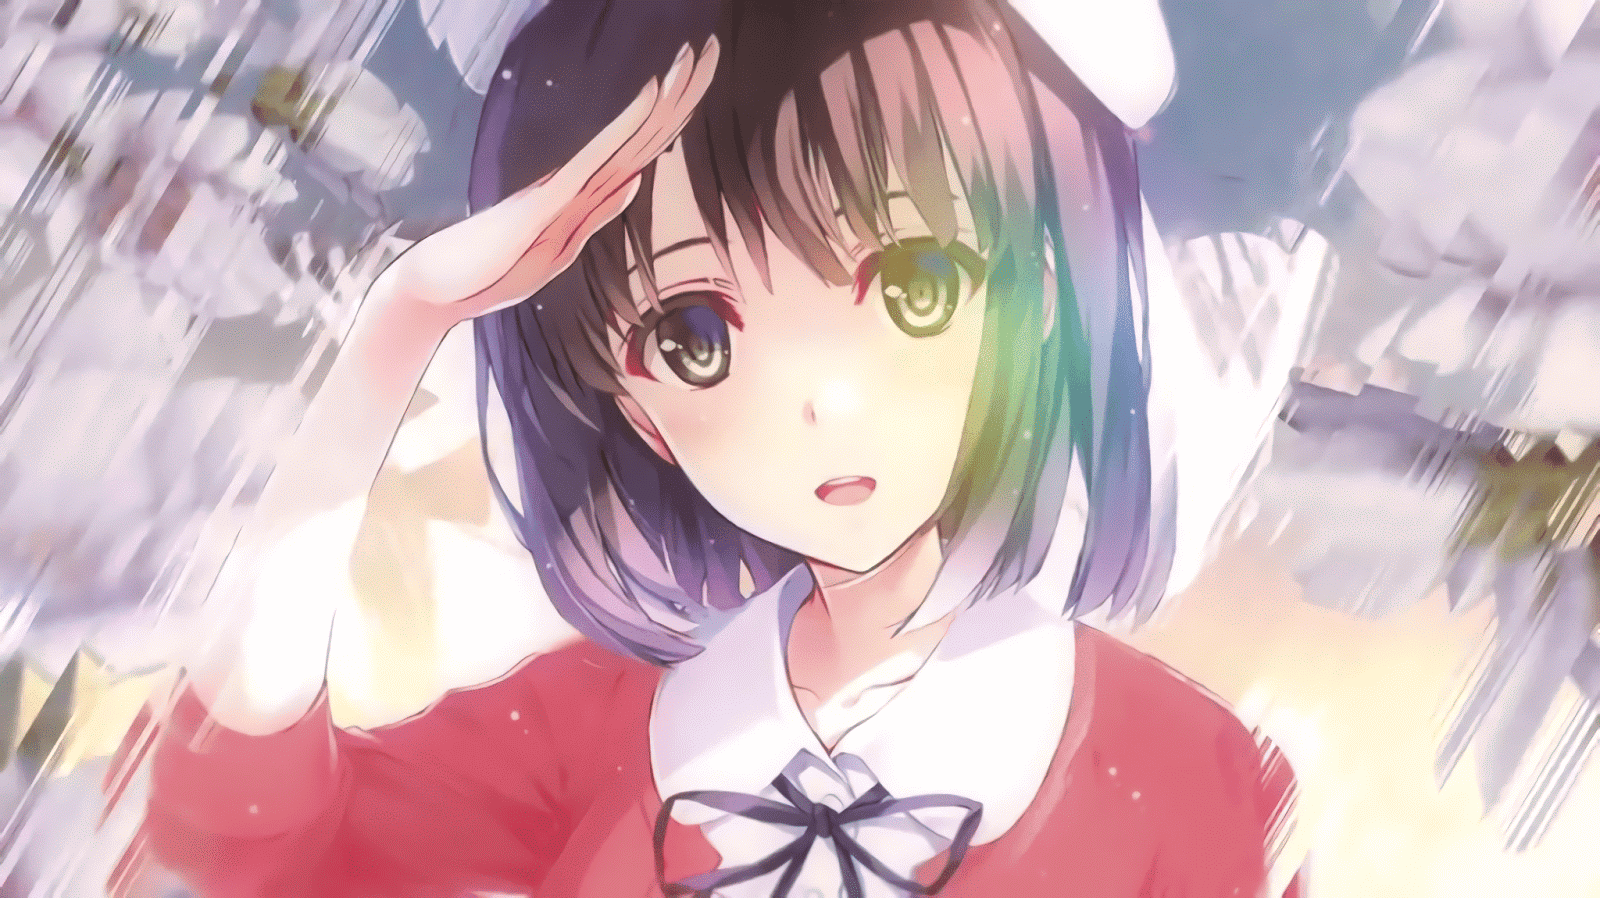 Anime Characters Kuudere : Top kuudere anime girl characters desonime all